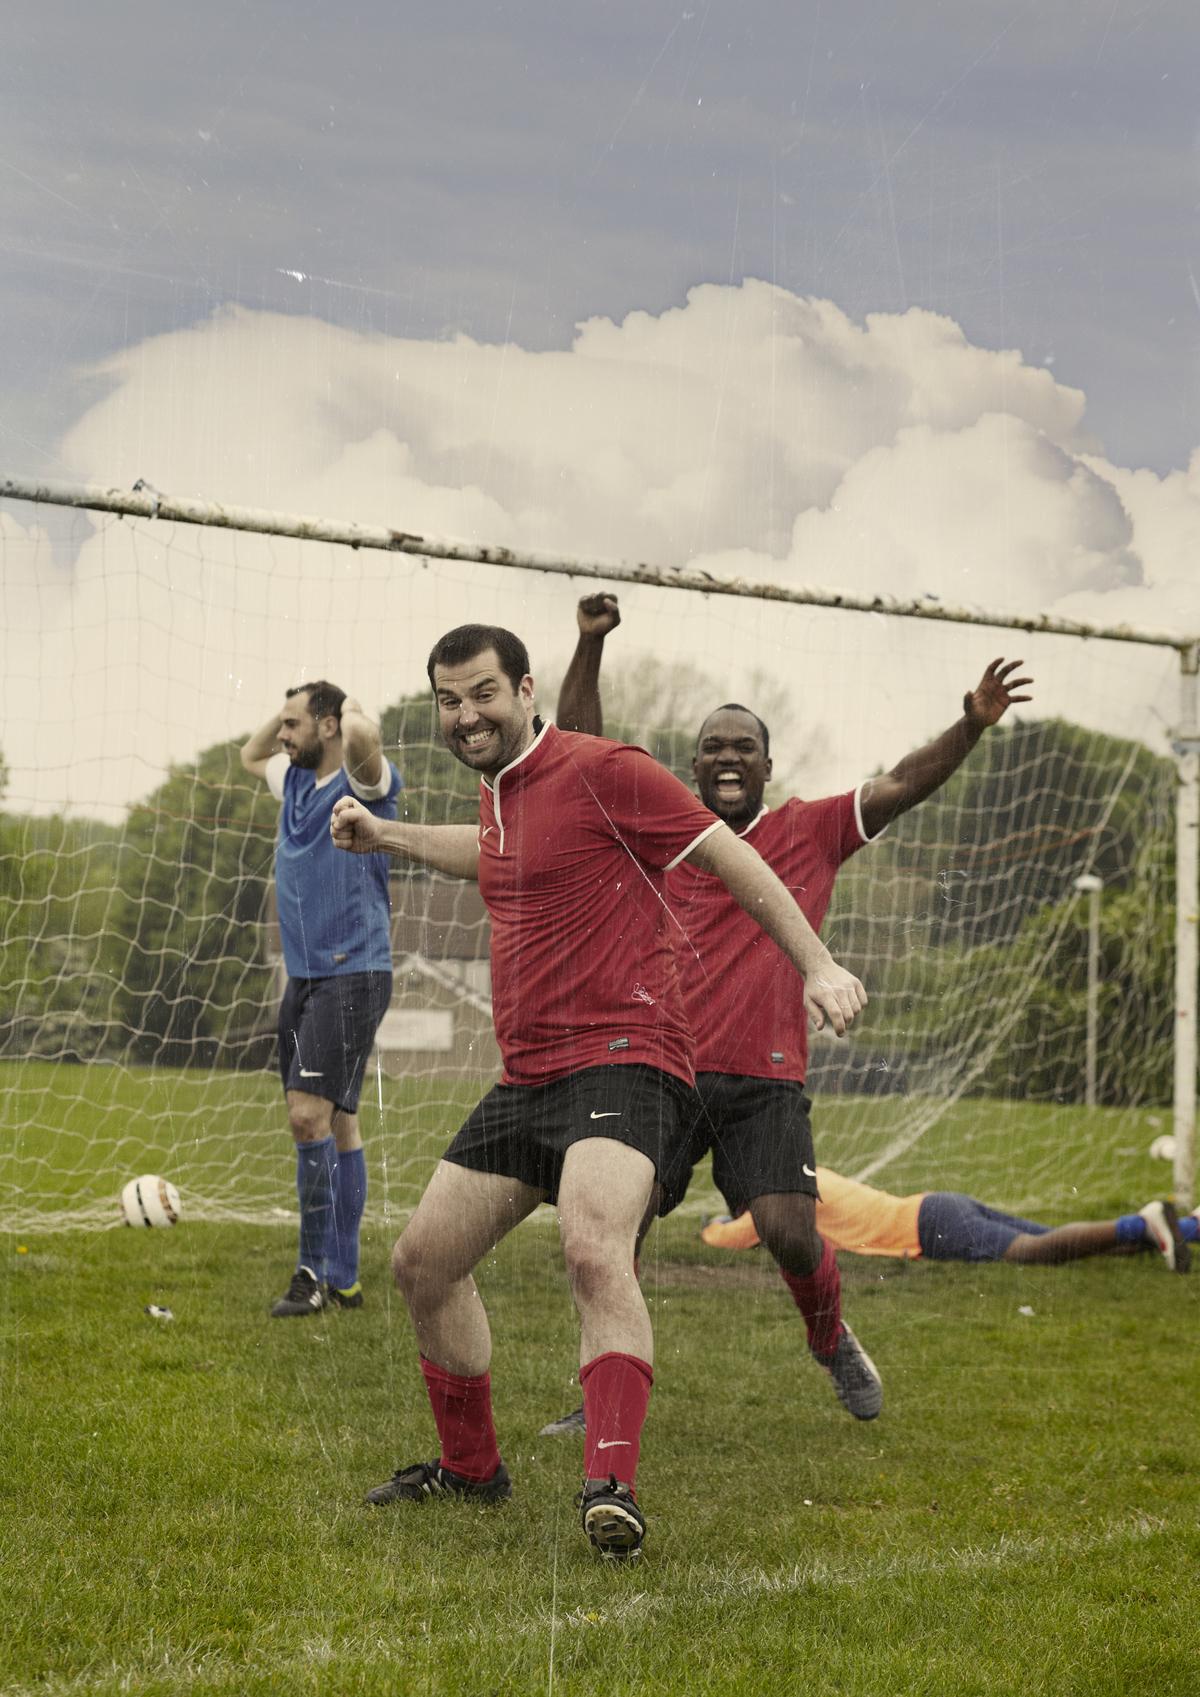 RanaldMackechnie.The FA. 'Love Football. Play Football2.jpg